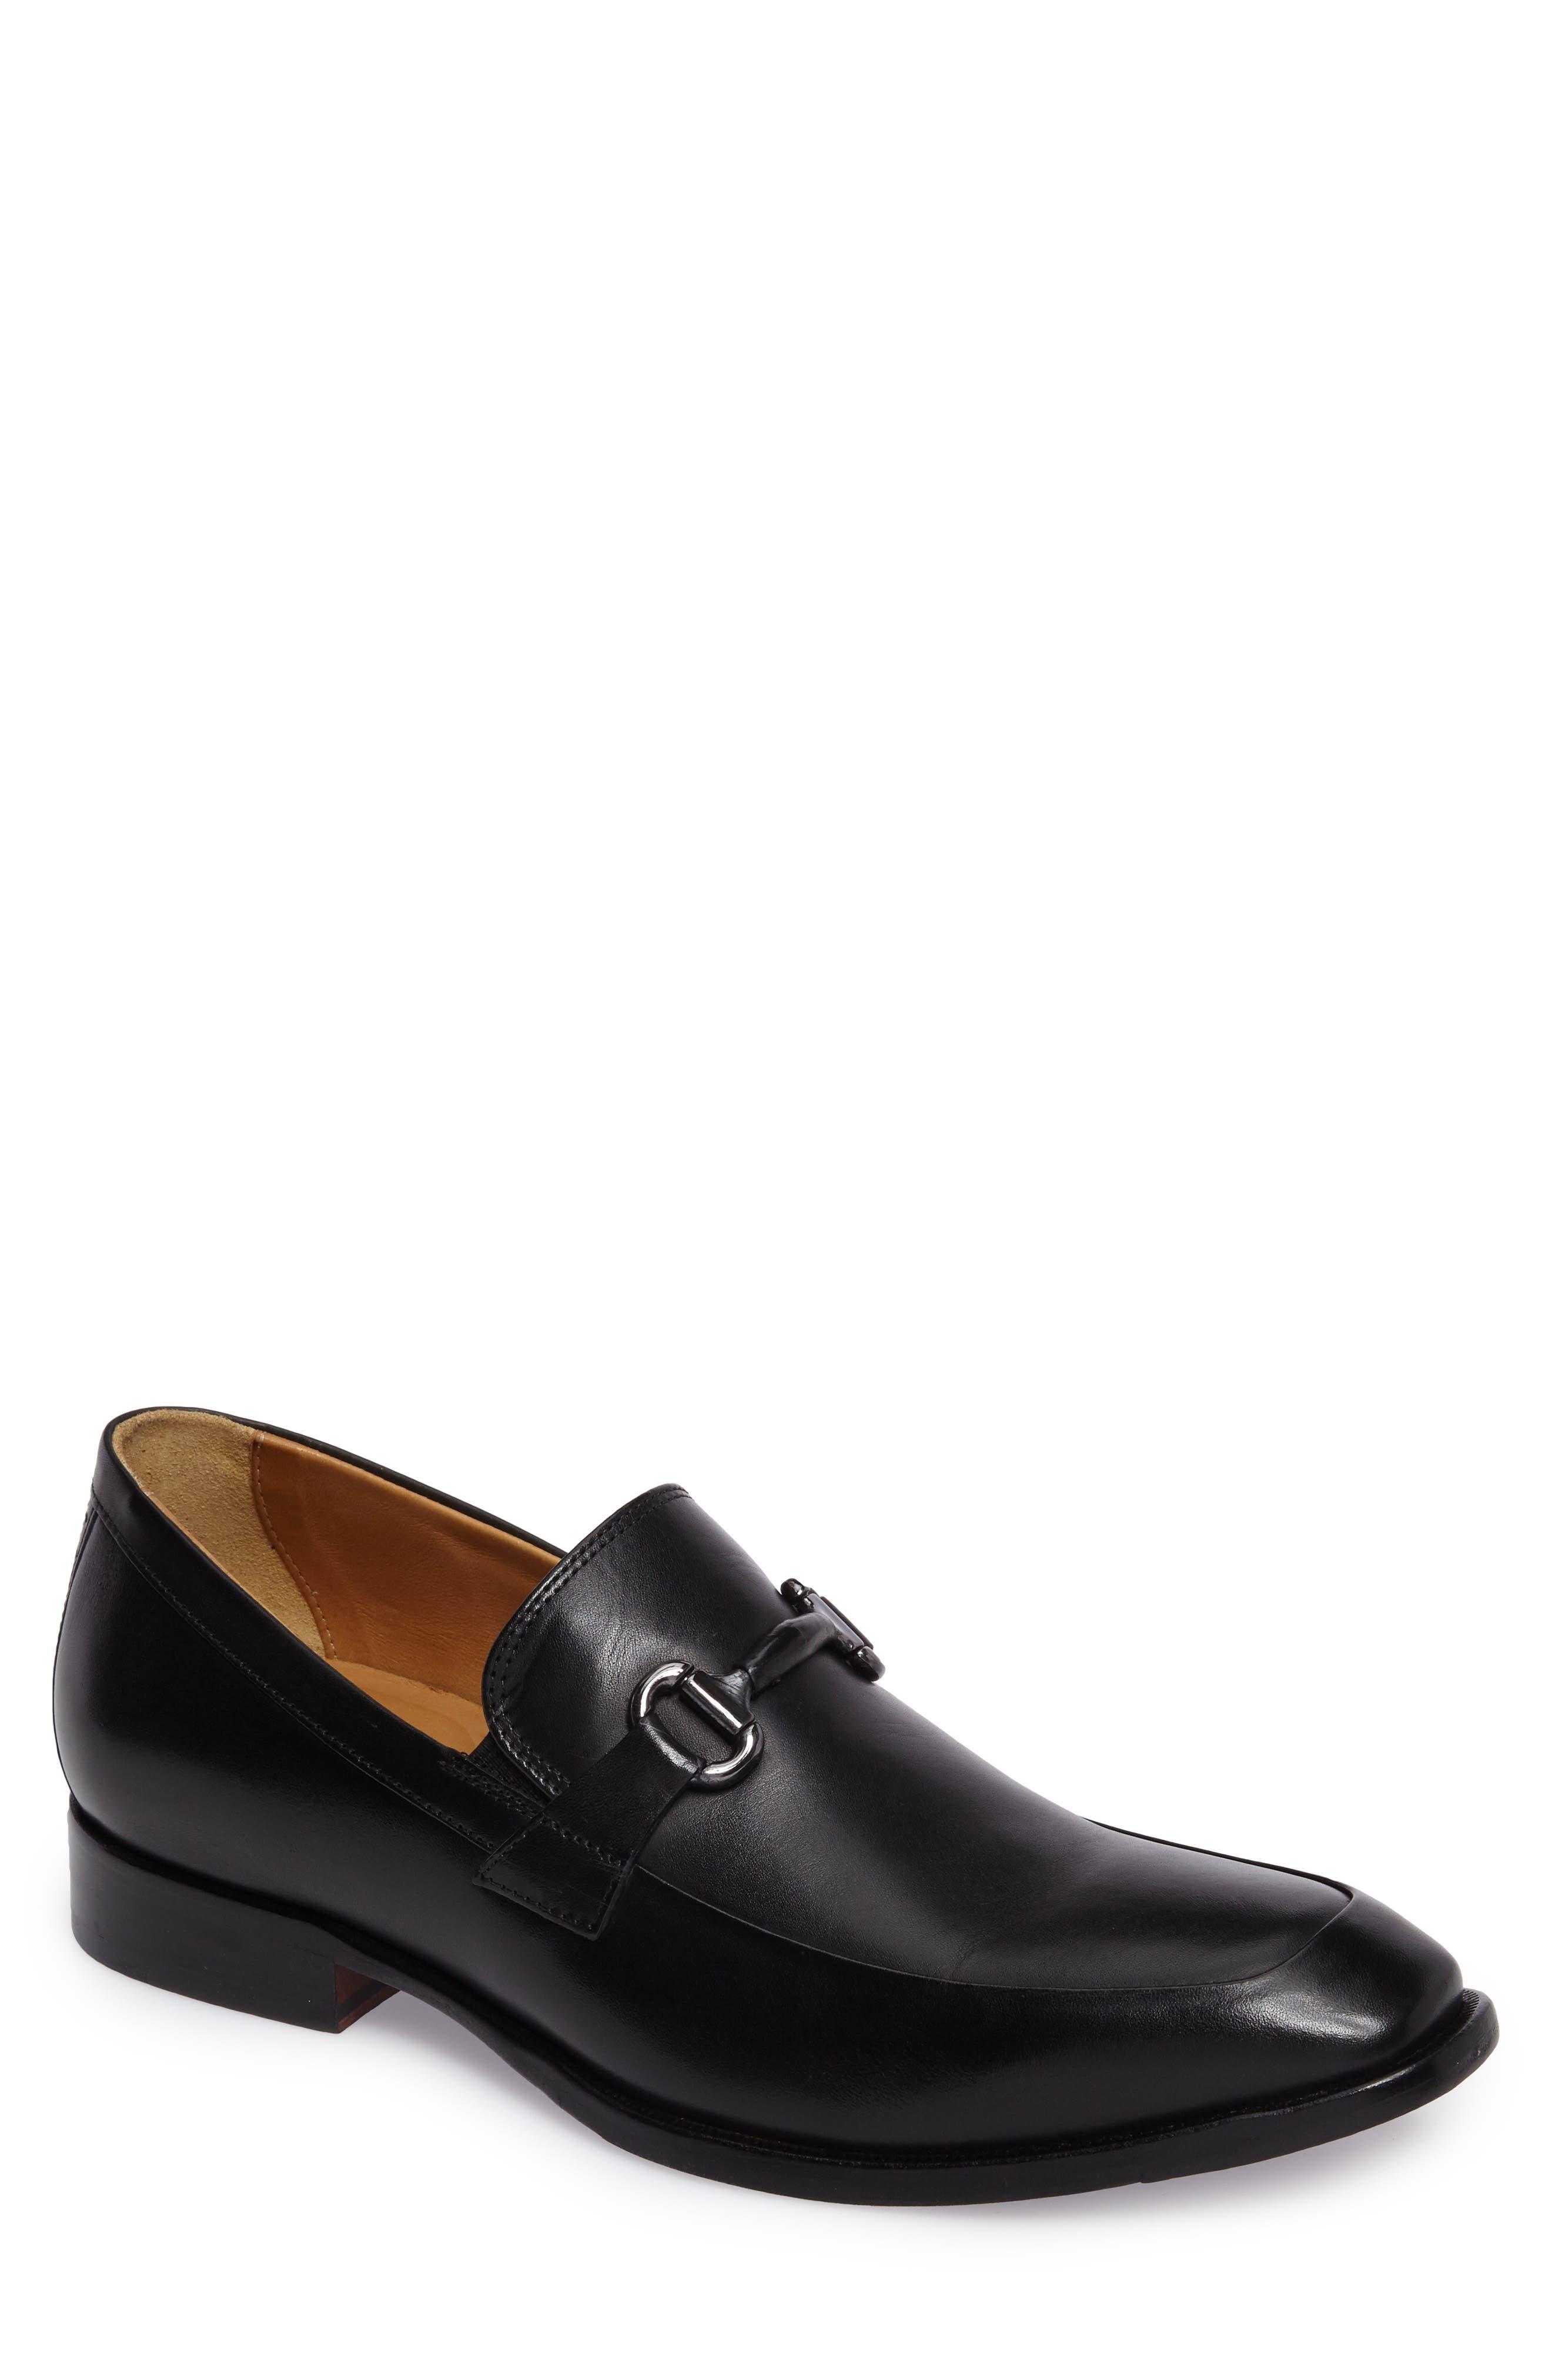 McClain Bit Loafer,                         Main,                         color, Black